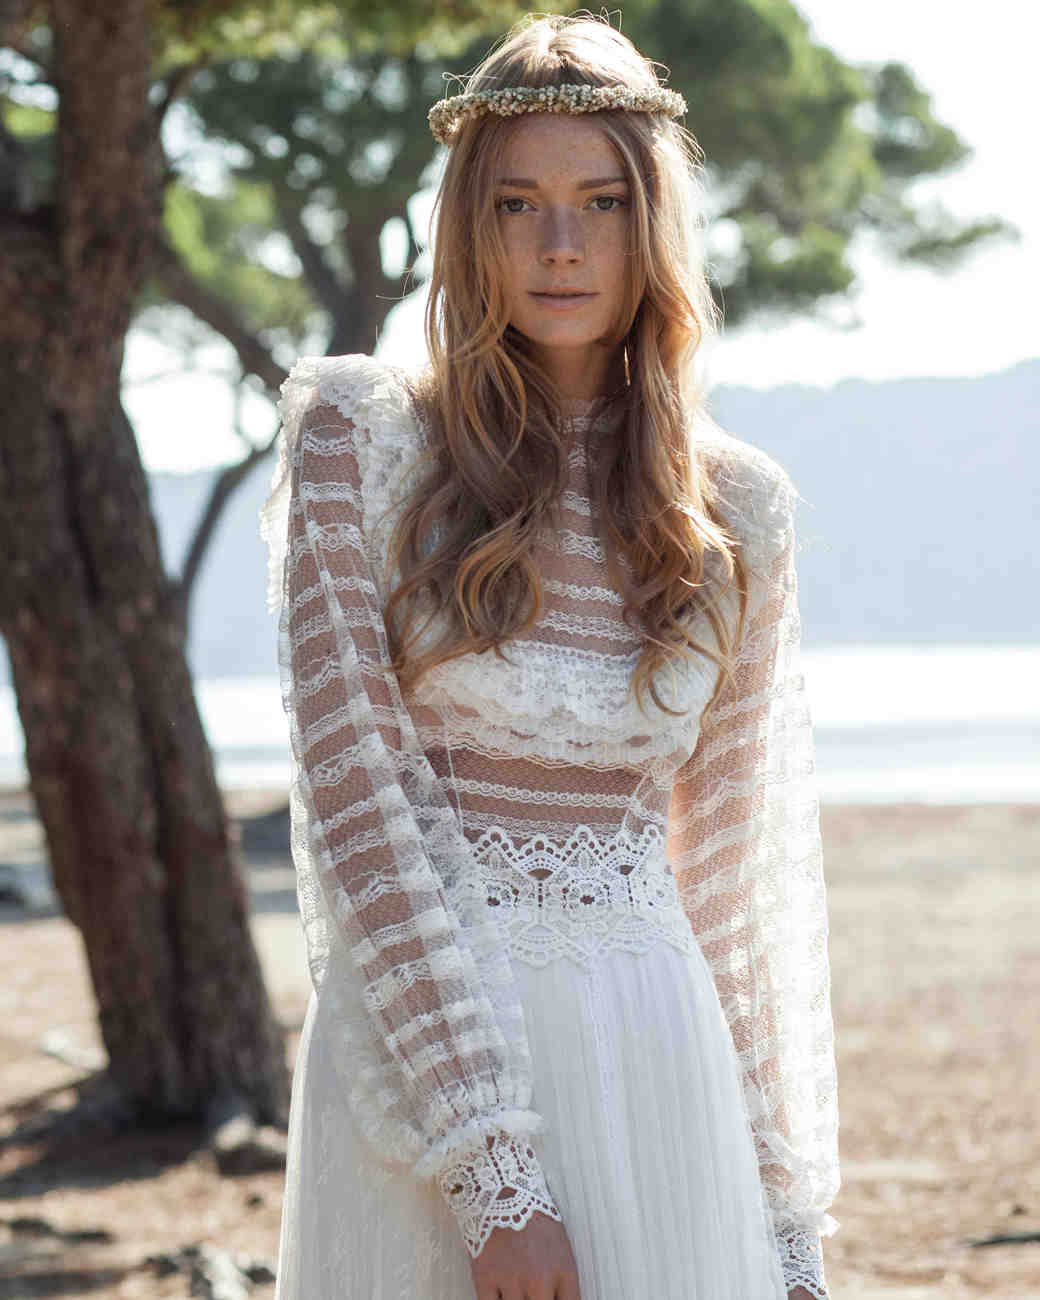 costarellos-fall2016-wedding-dress-16-20.jpg